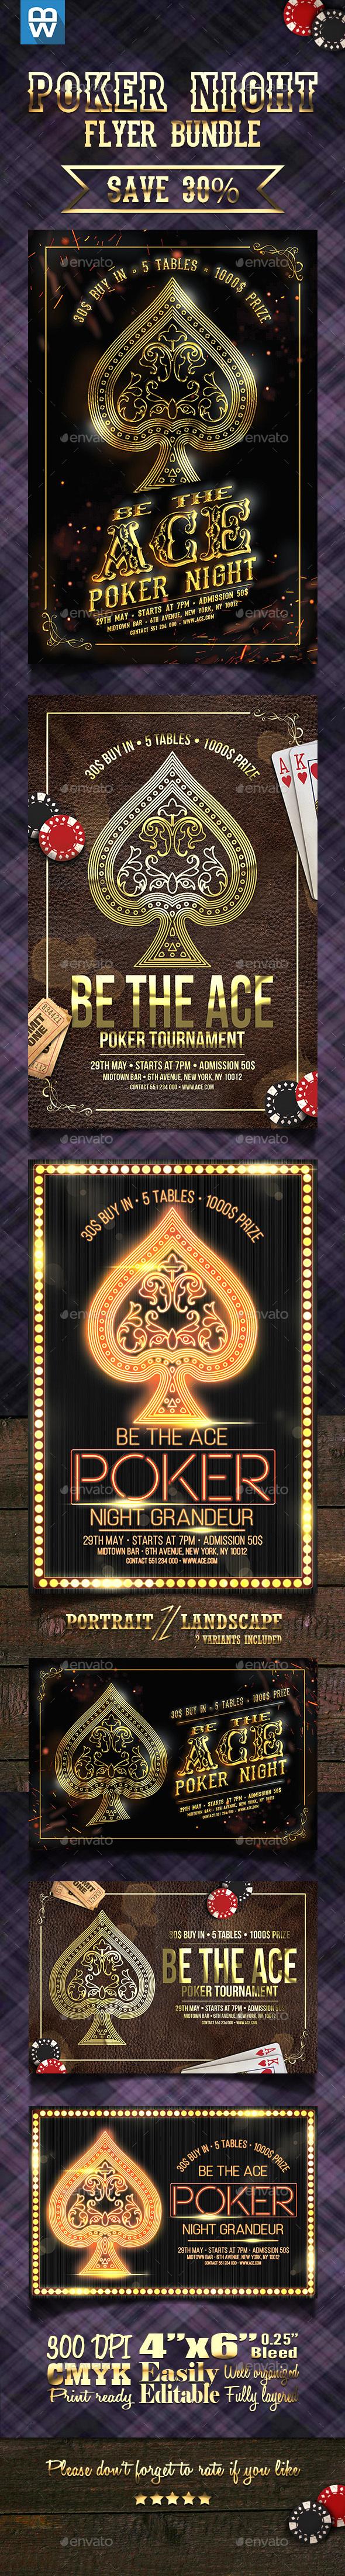 Poker Night Flyer Bundle